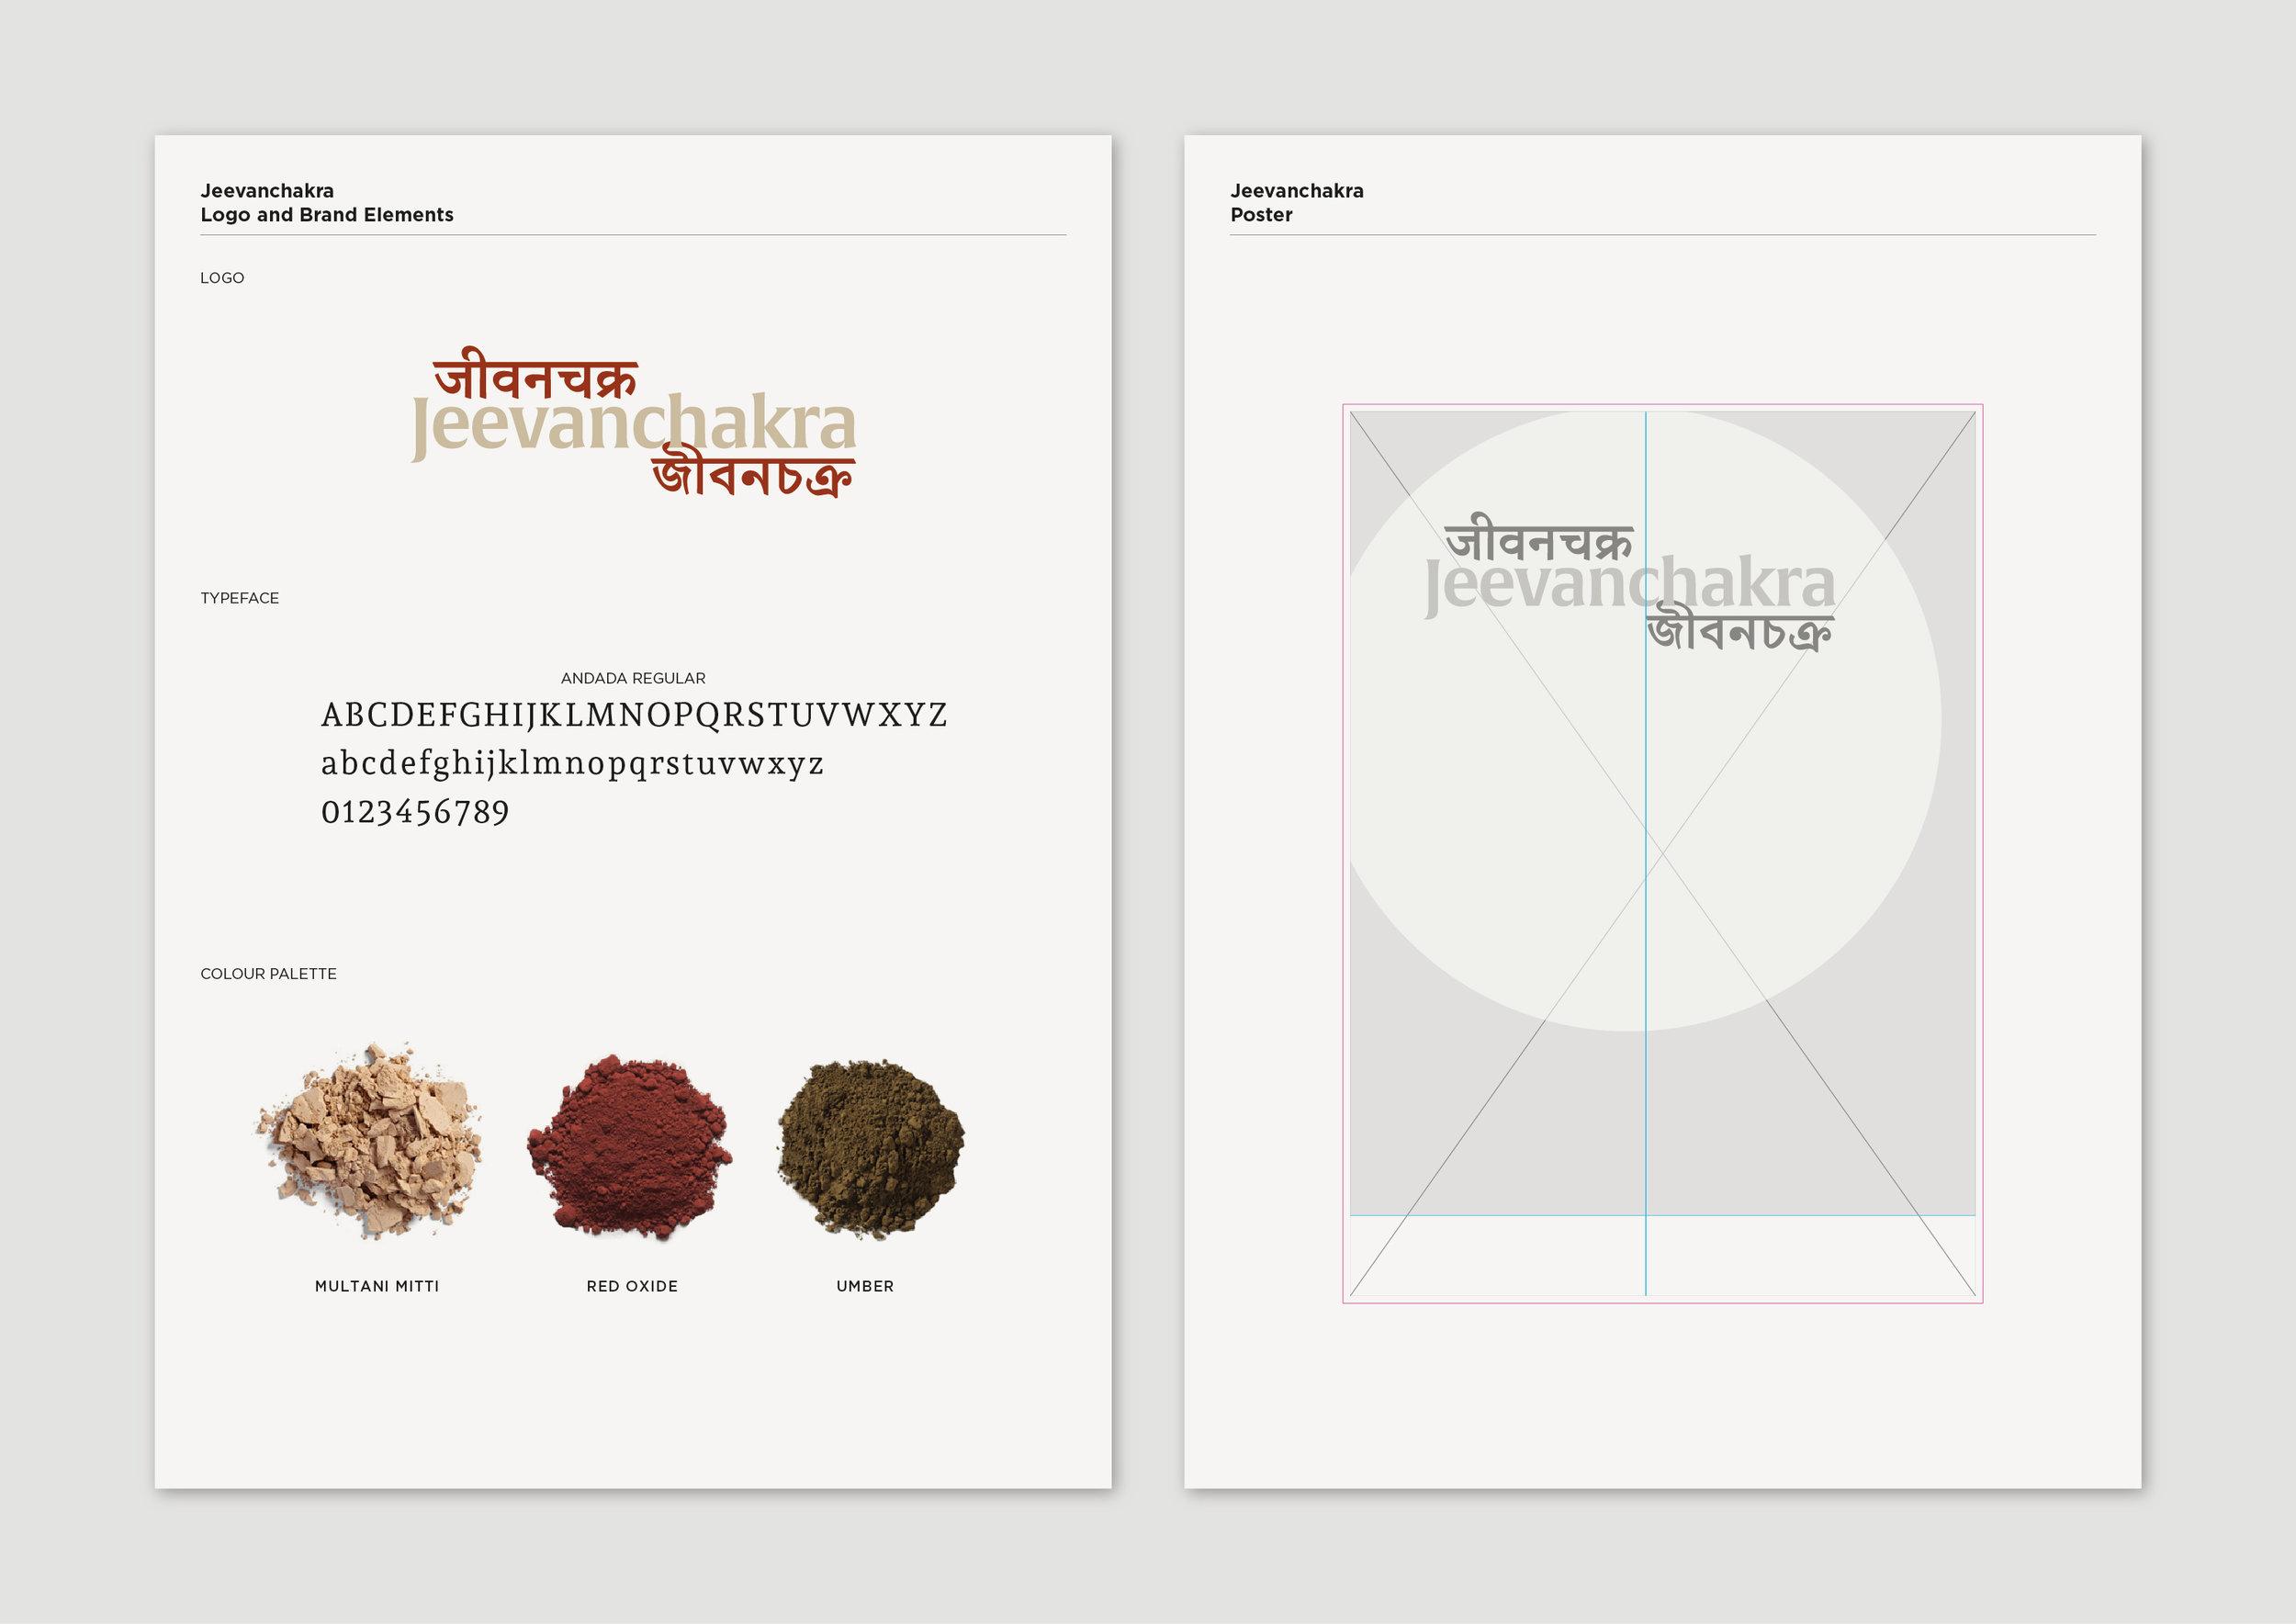 Jeevanchakra Identity Guidelines_3.jpg